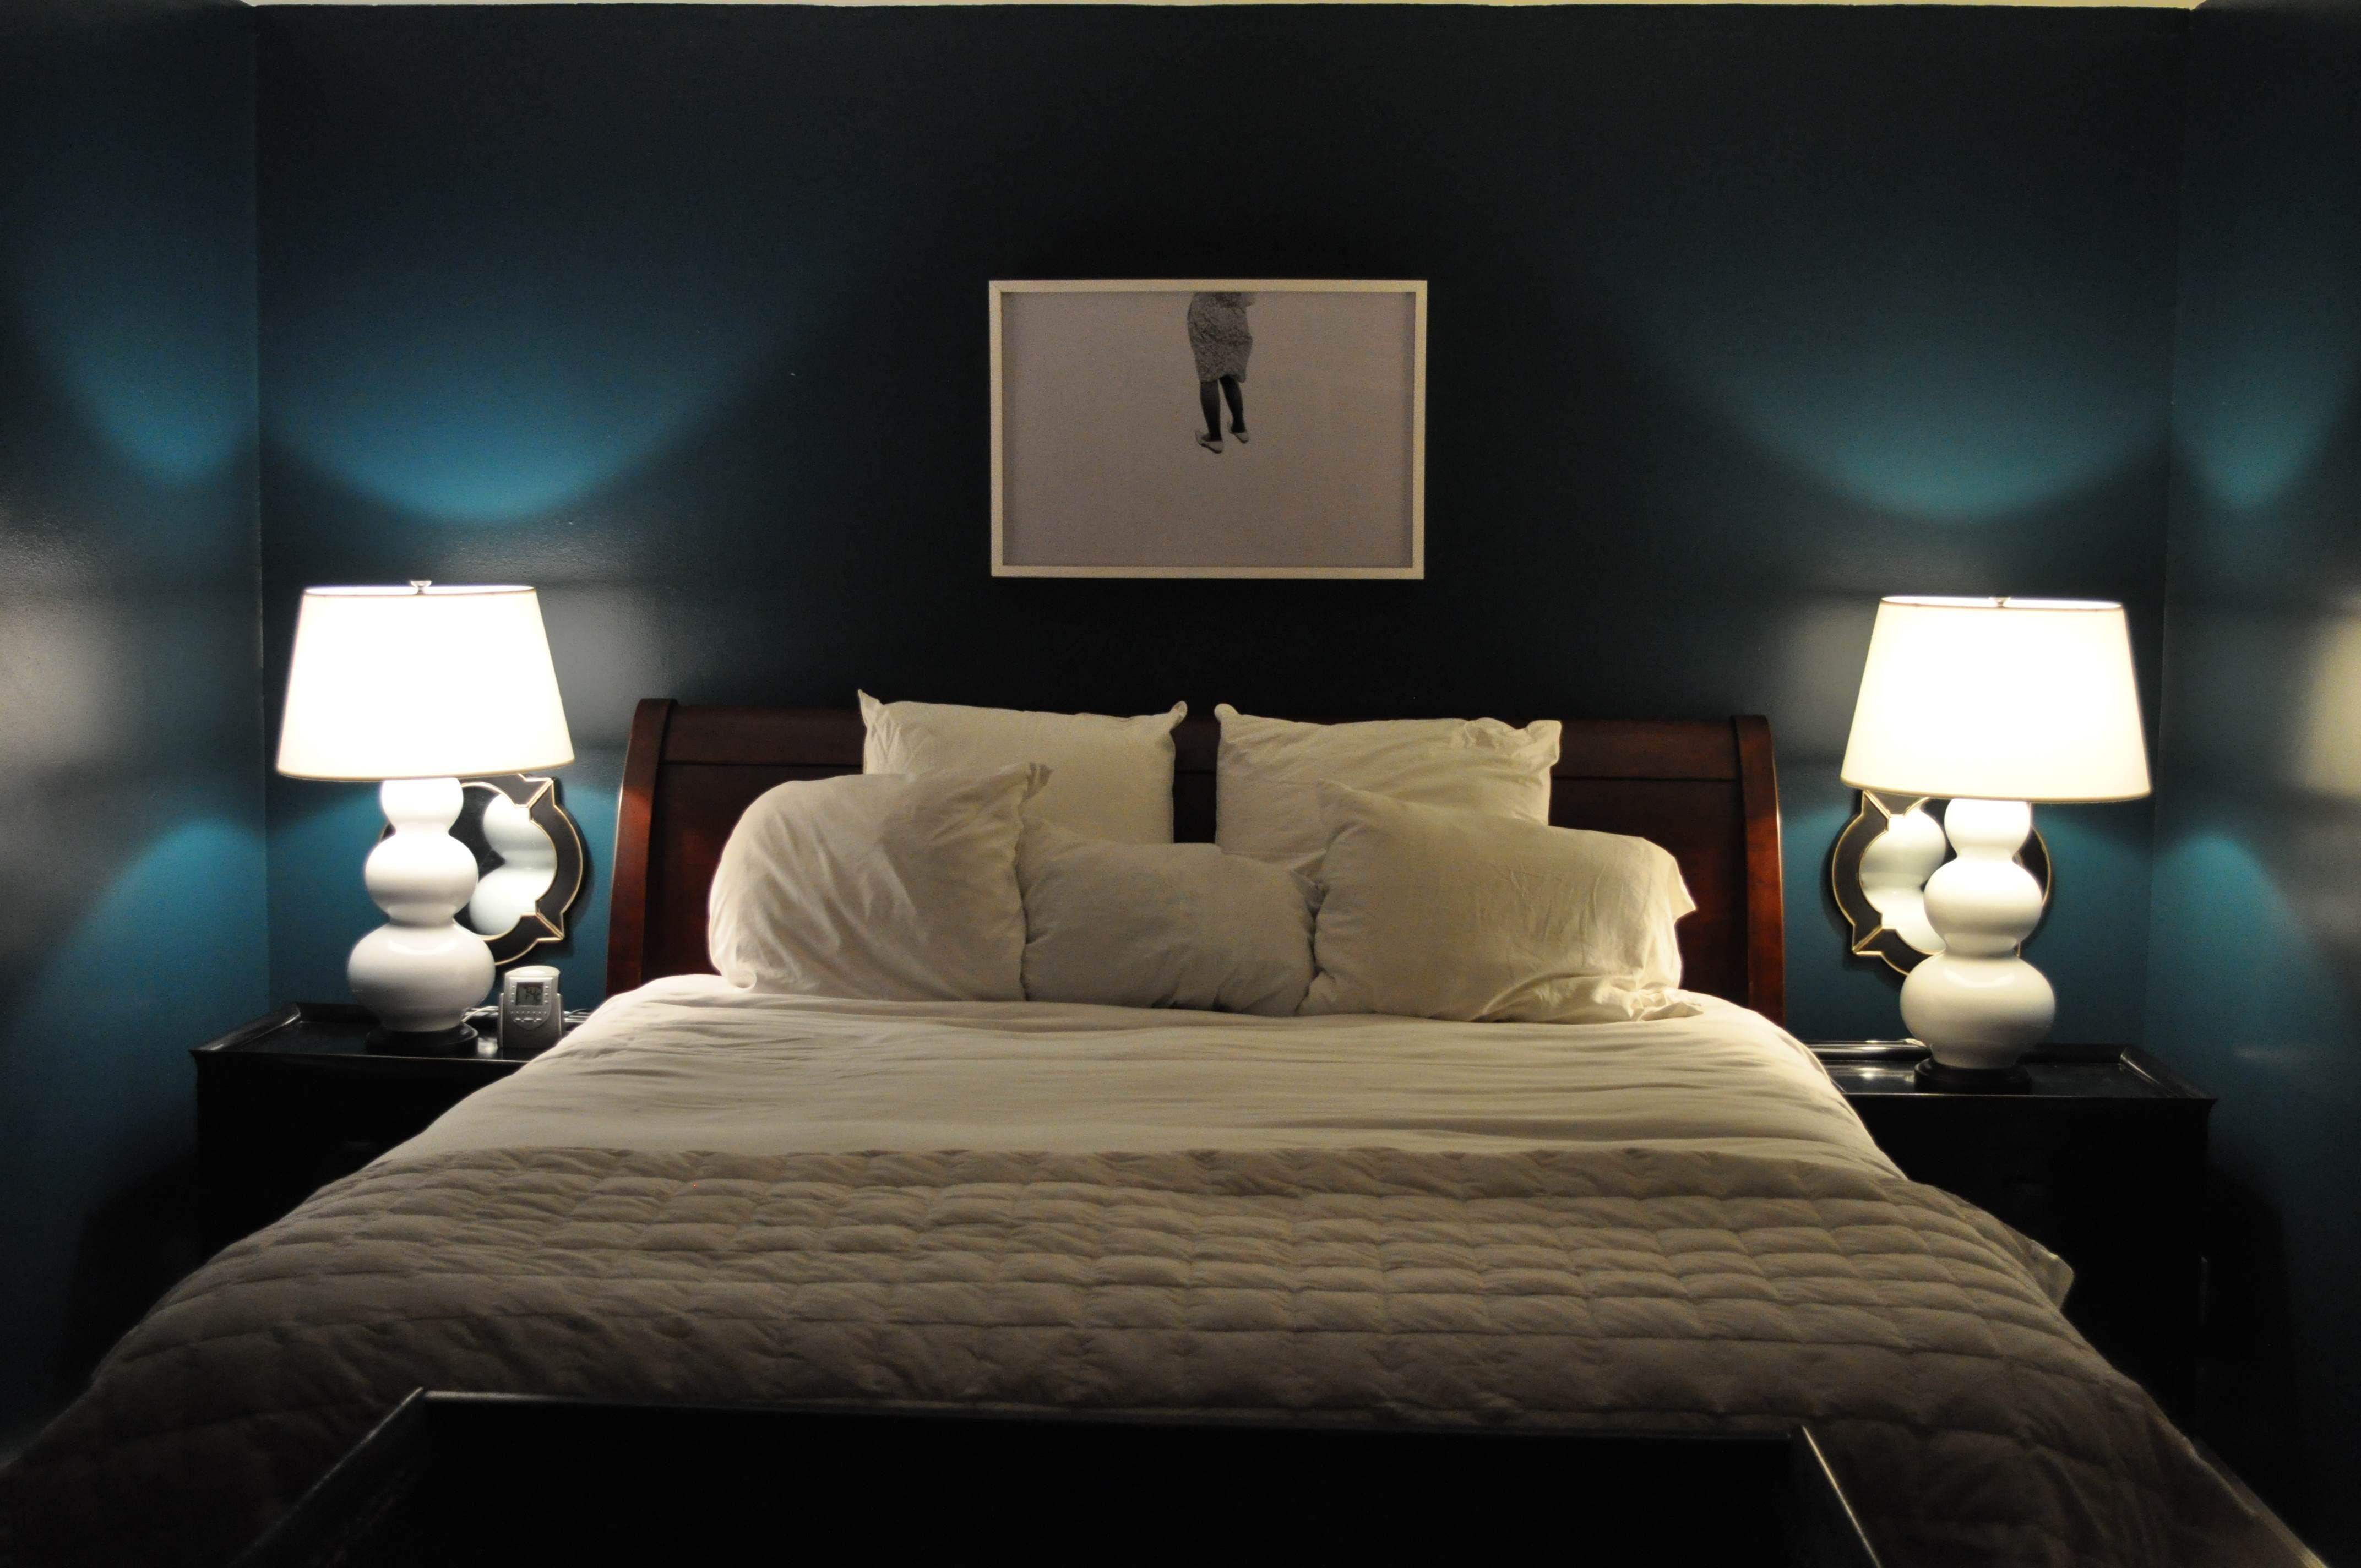 Pin by april sweeney on bedroom pinterest for Dark paint in bedroom